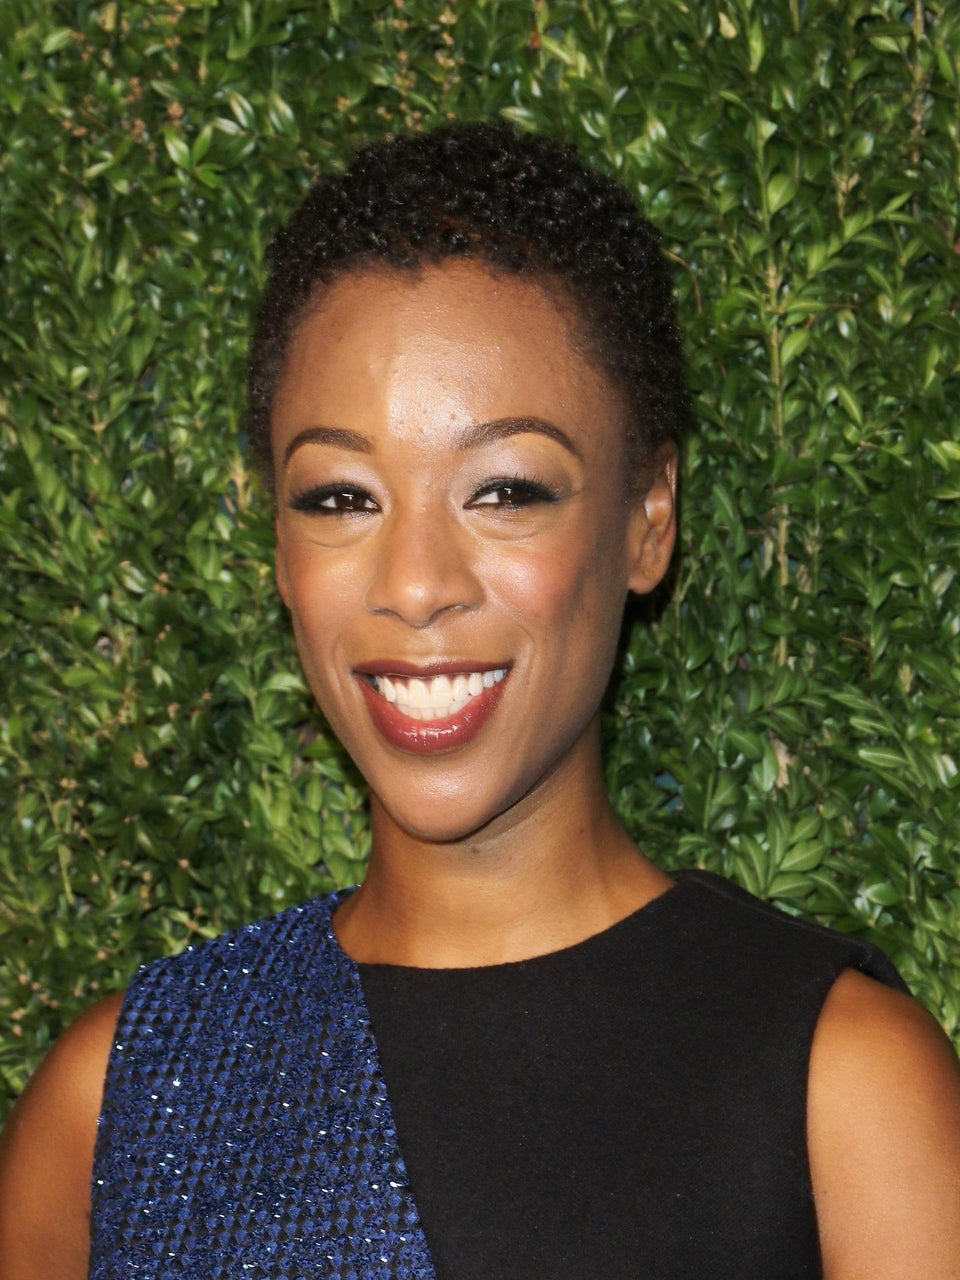 Samira Wiley on the Shocking Fourth Season of 'OITNB'